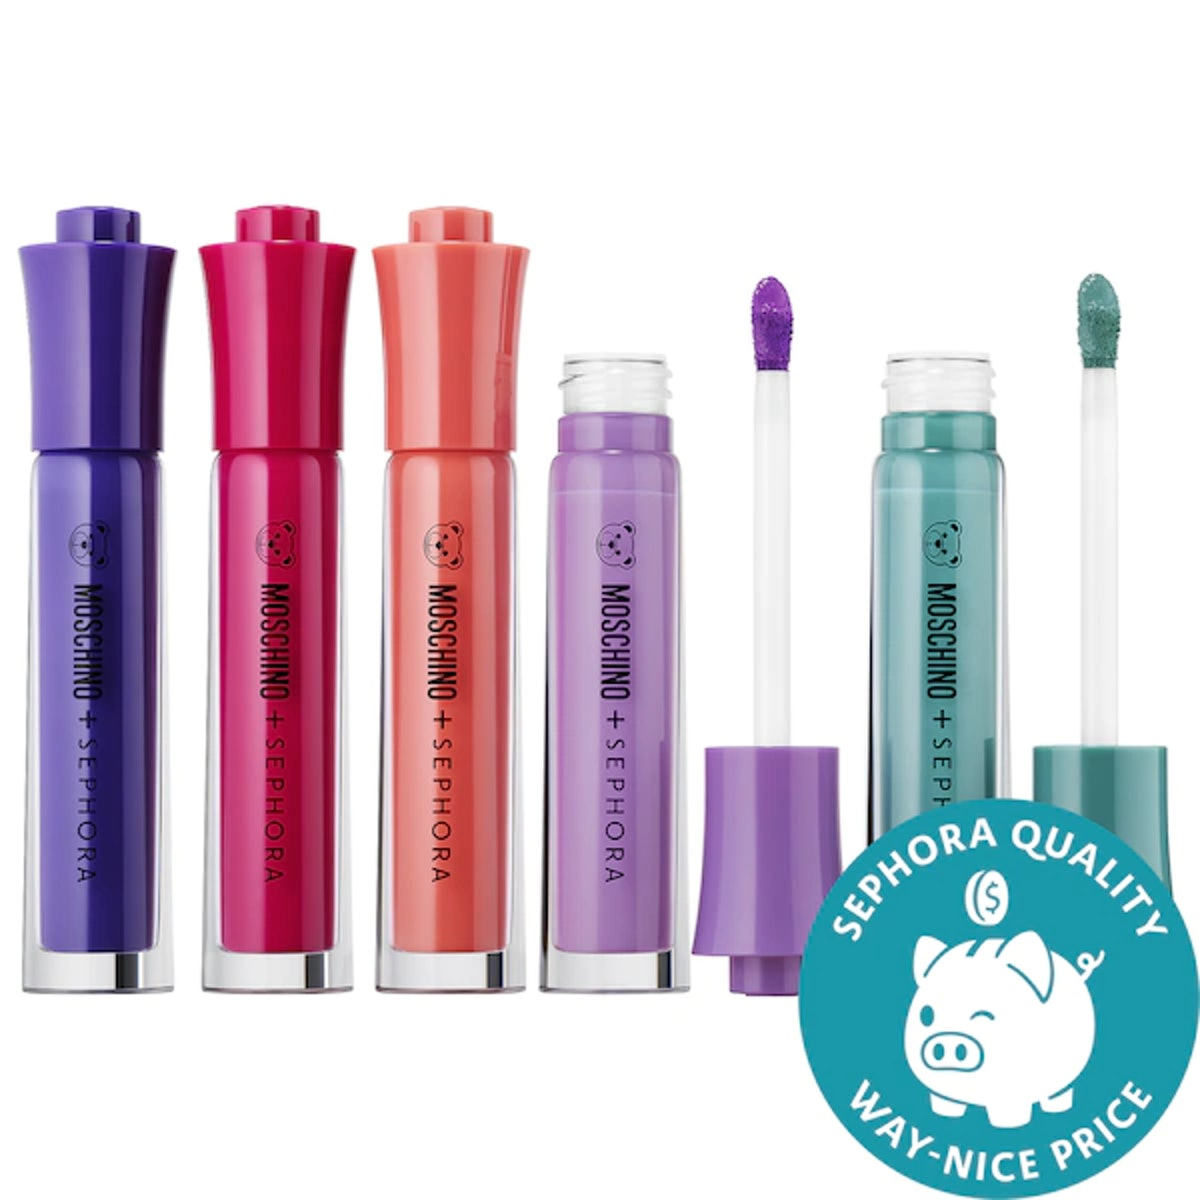 Moschino + Sephora Liquid Markers Lip Set